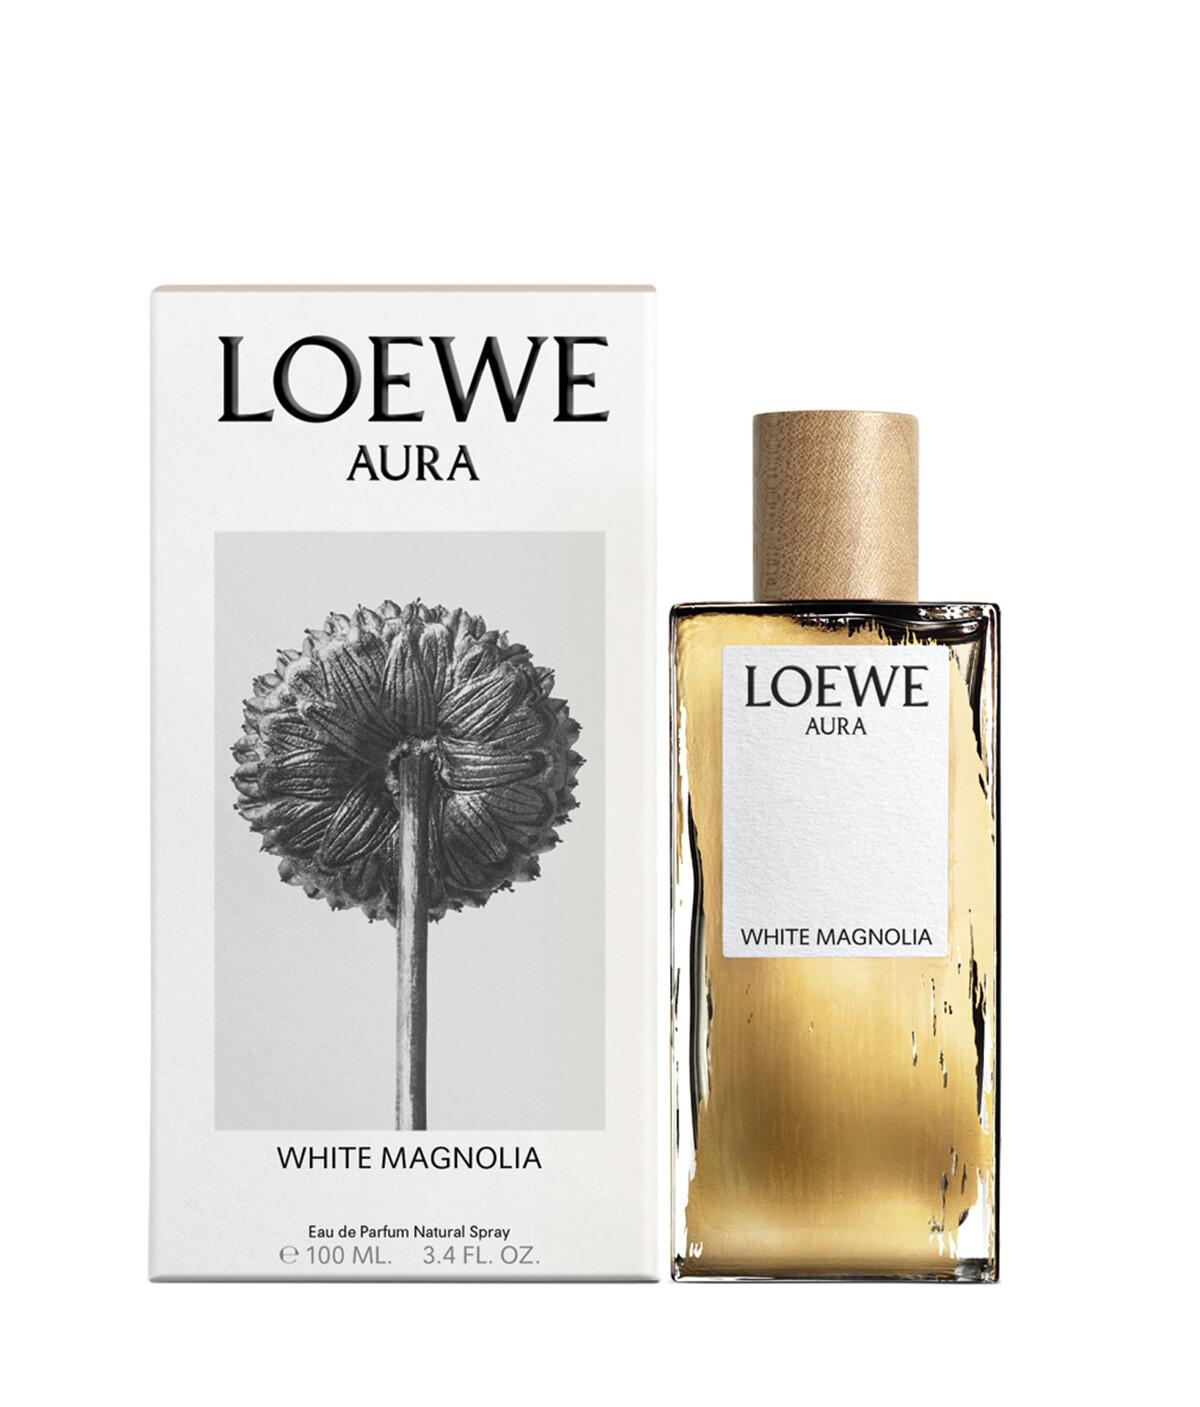 LOEWE Loewe Aura White Magnolia Edp 100Ml Colourless front